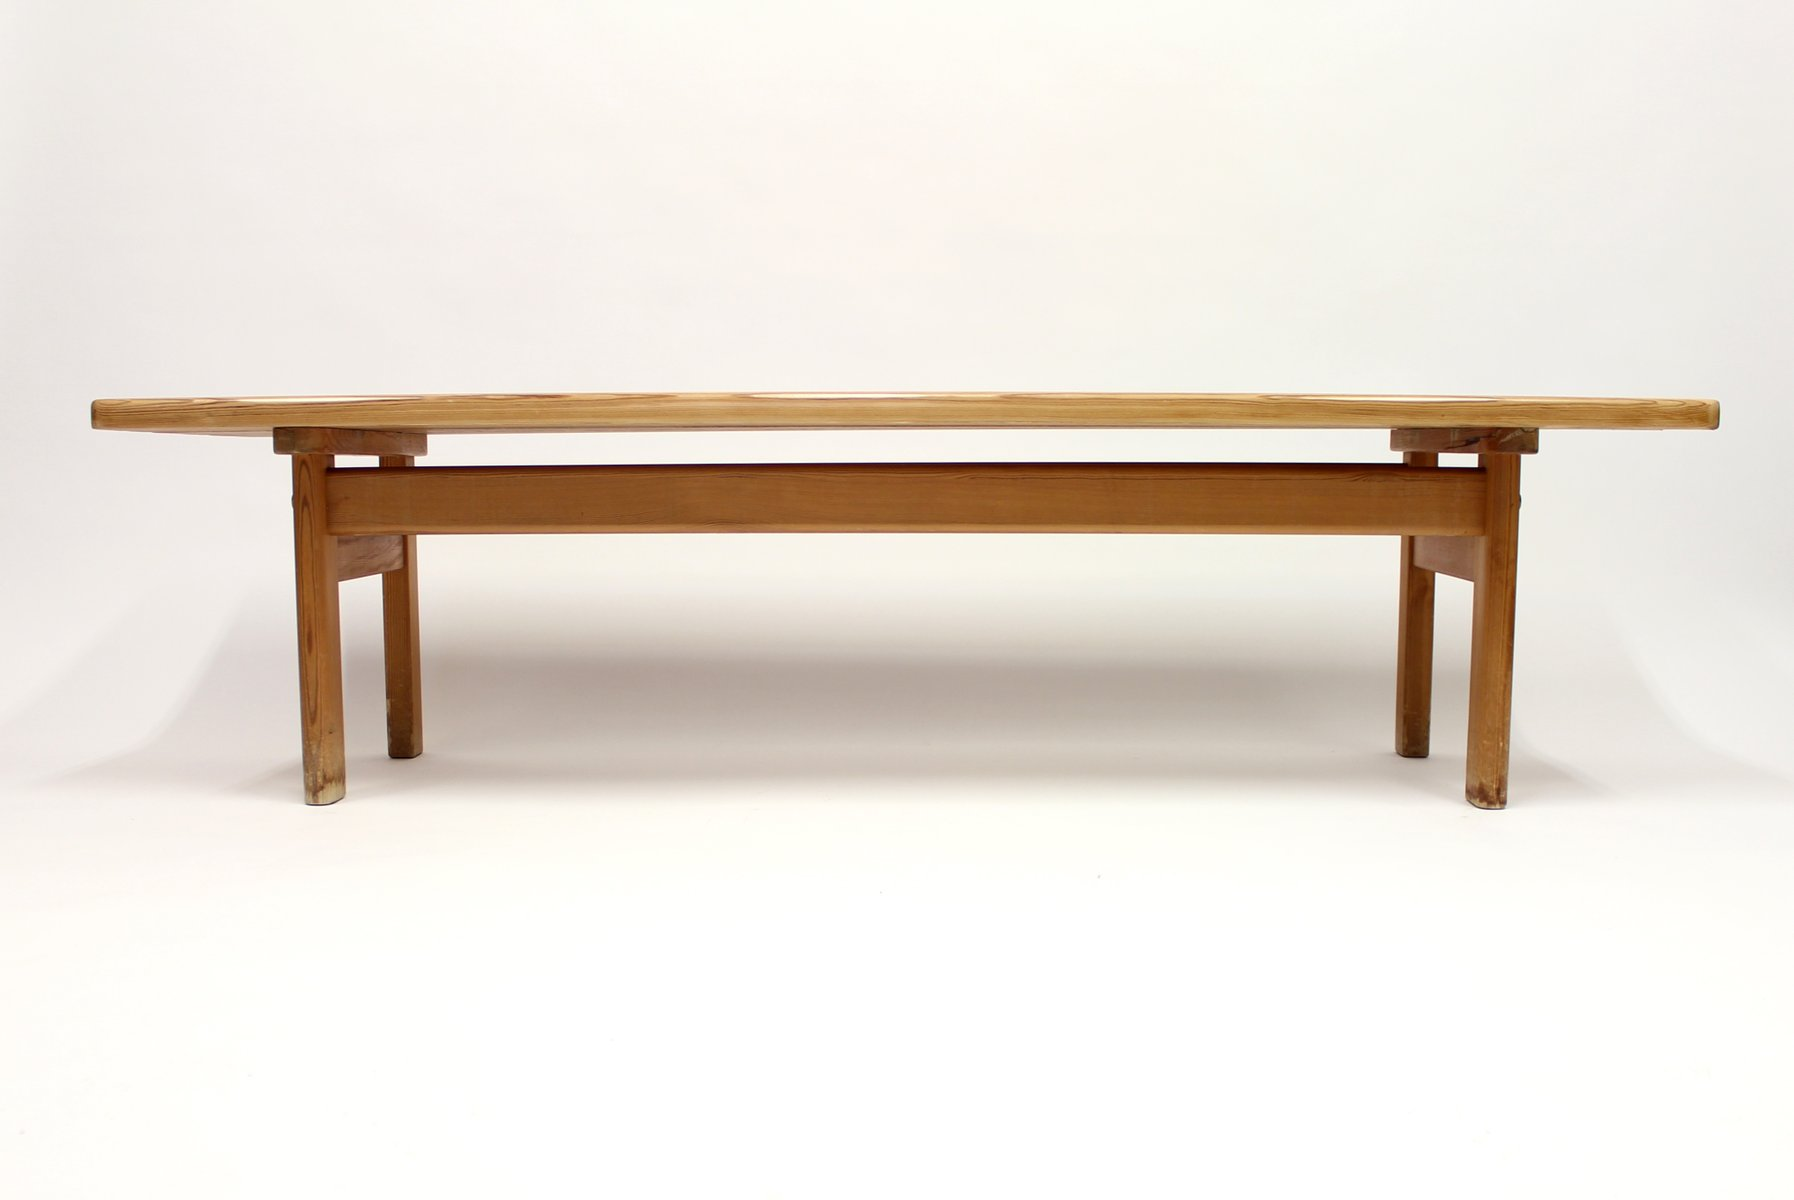 Asserbo Pine Bench By Børge Mogensen For Karl Andersson U0026 Söner, 1960s